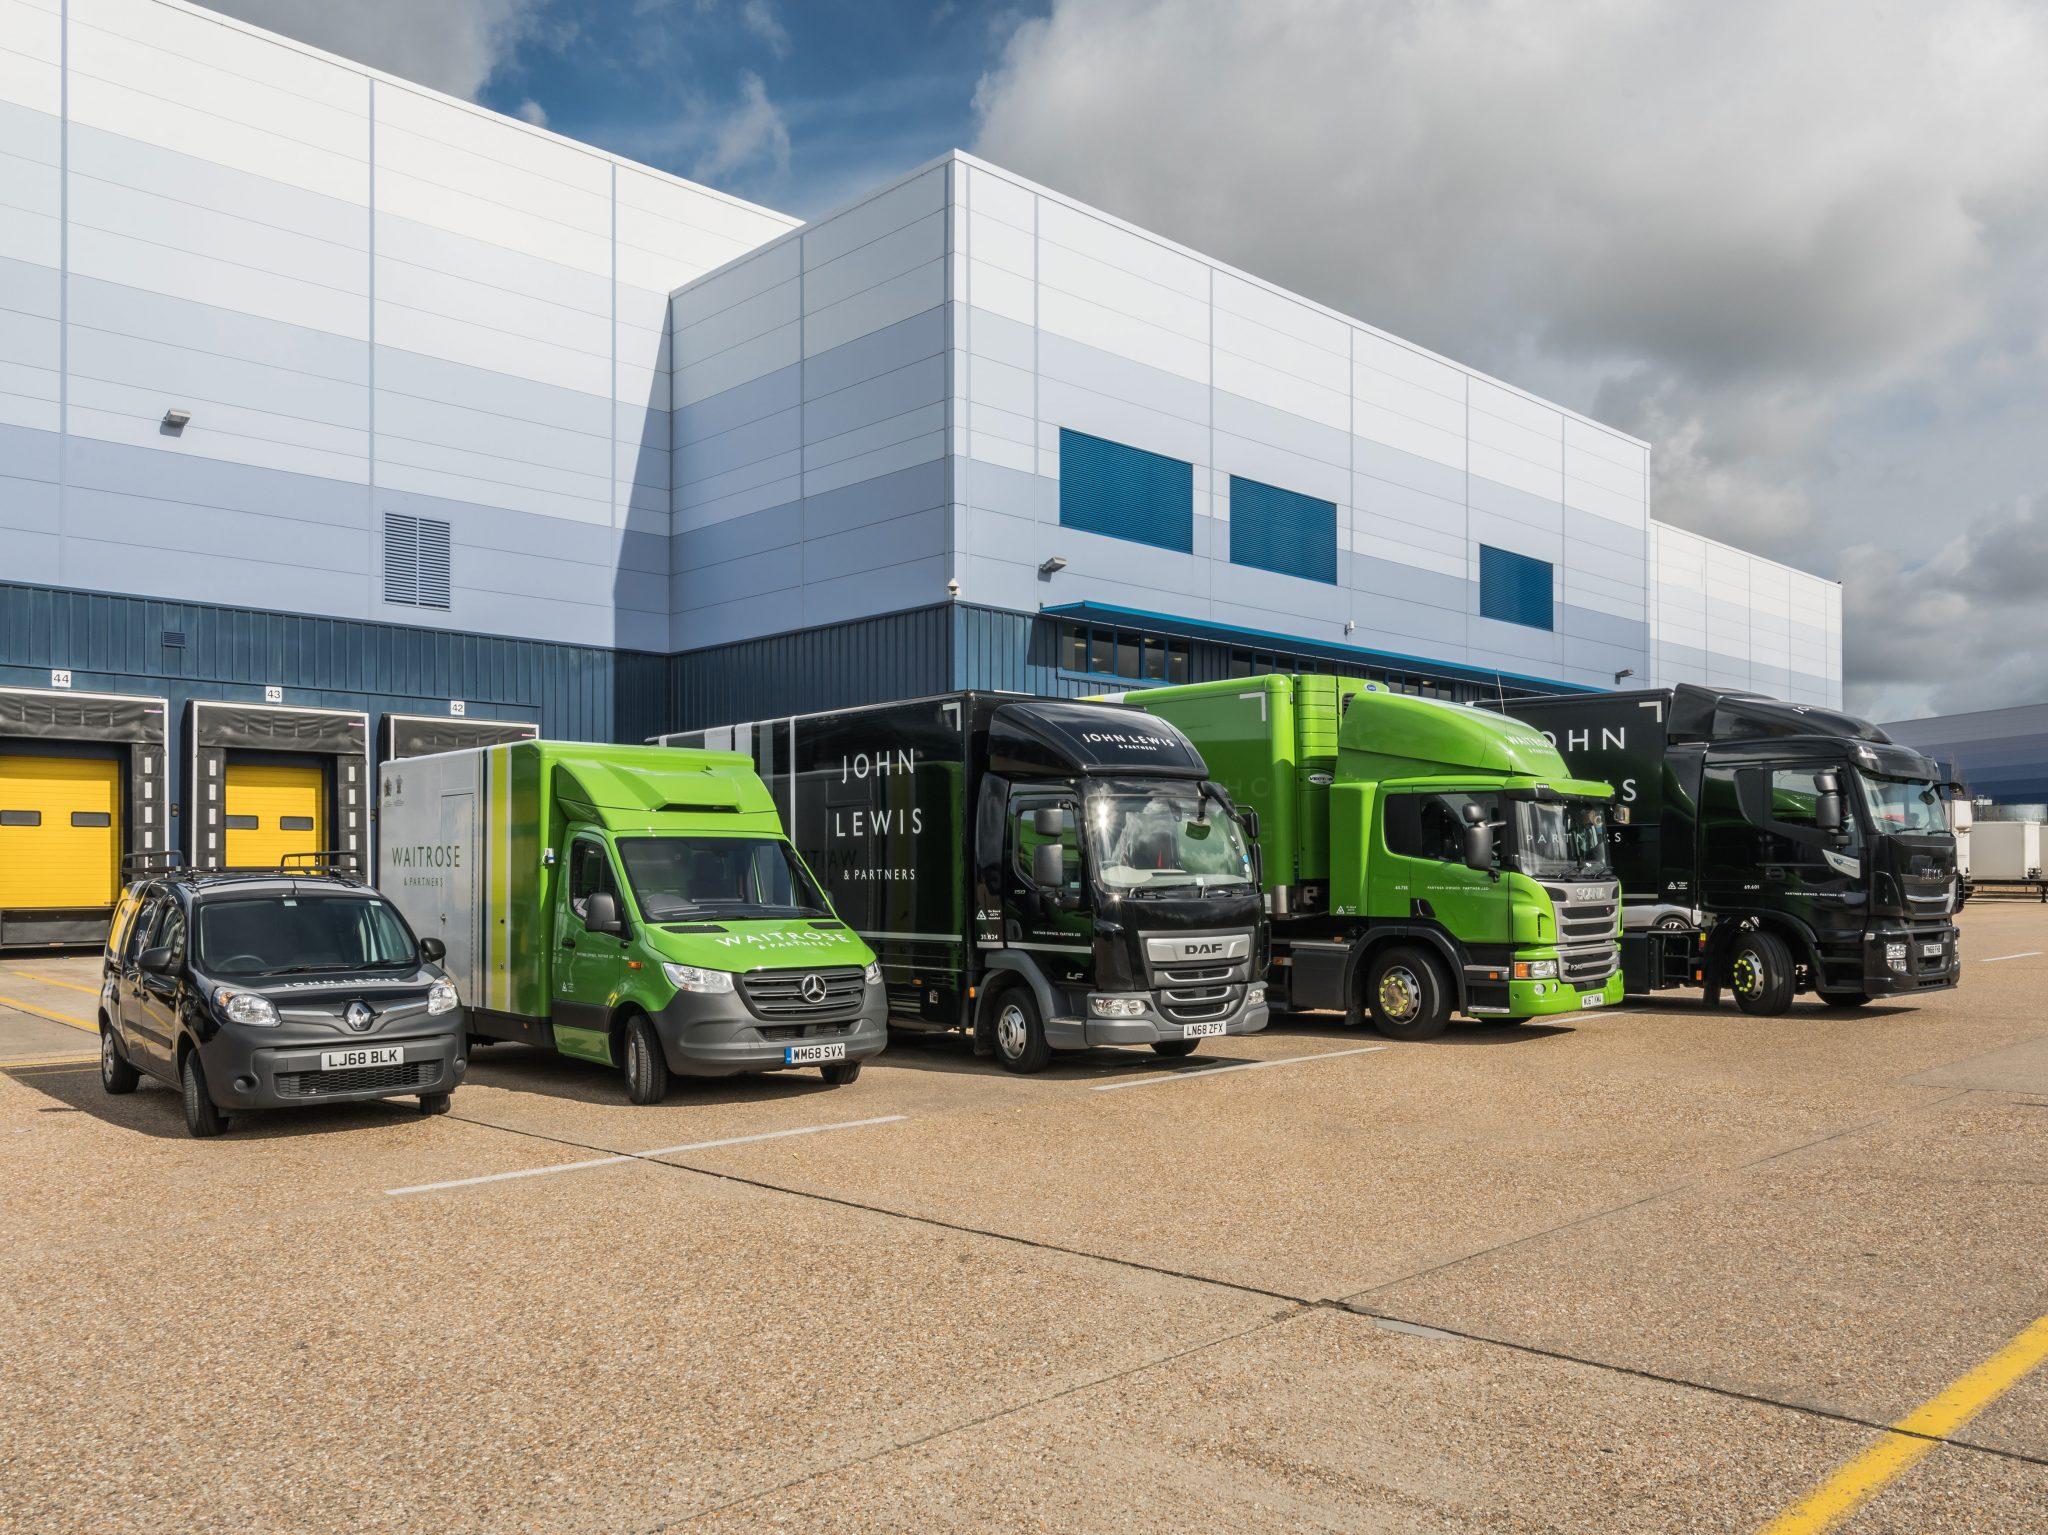 Green goods vehicles from John Lewis Partnership